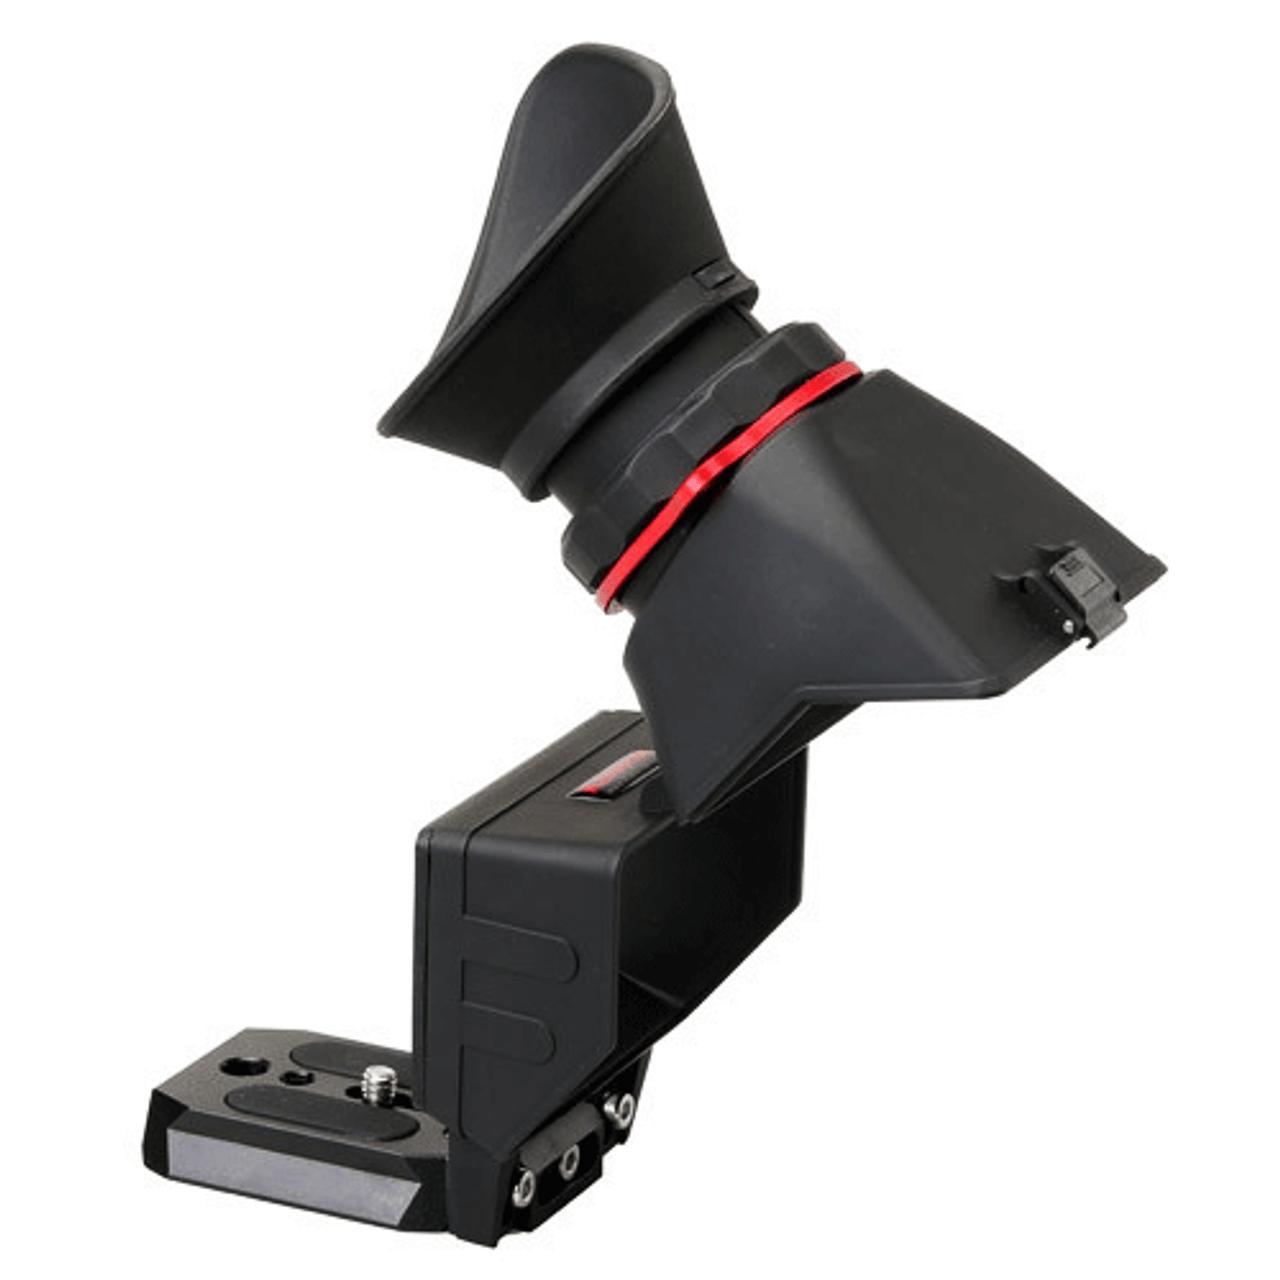 Kamerar QV-1 LCD Viewfinder